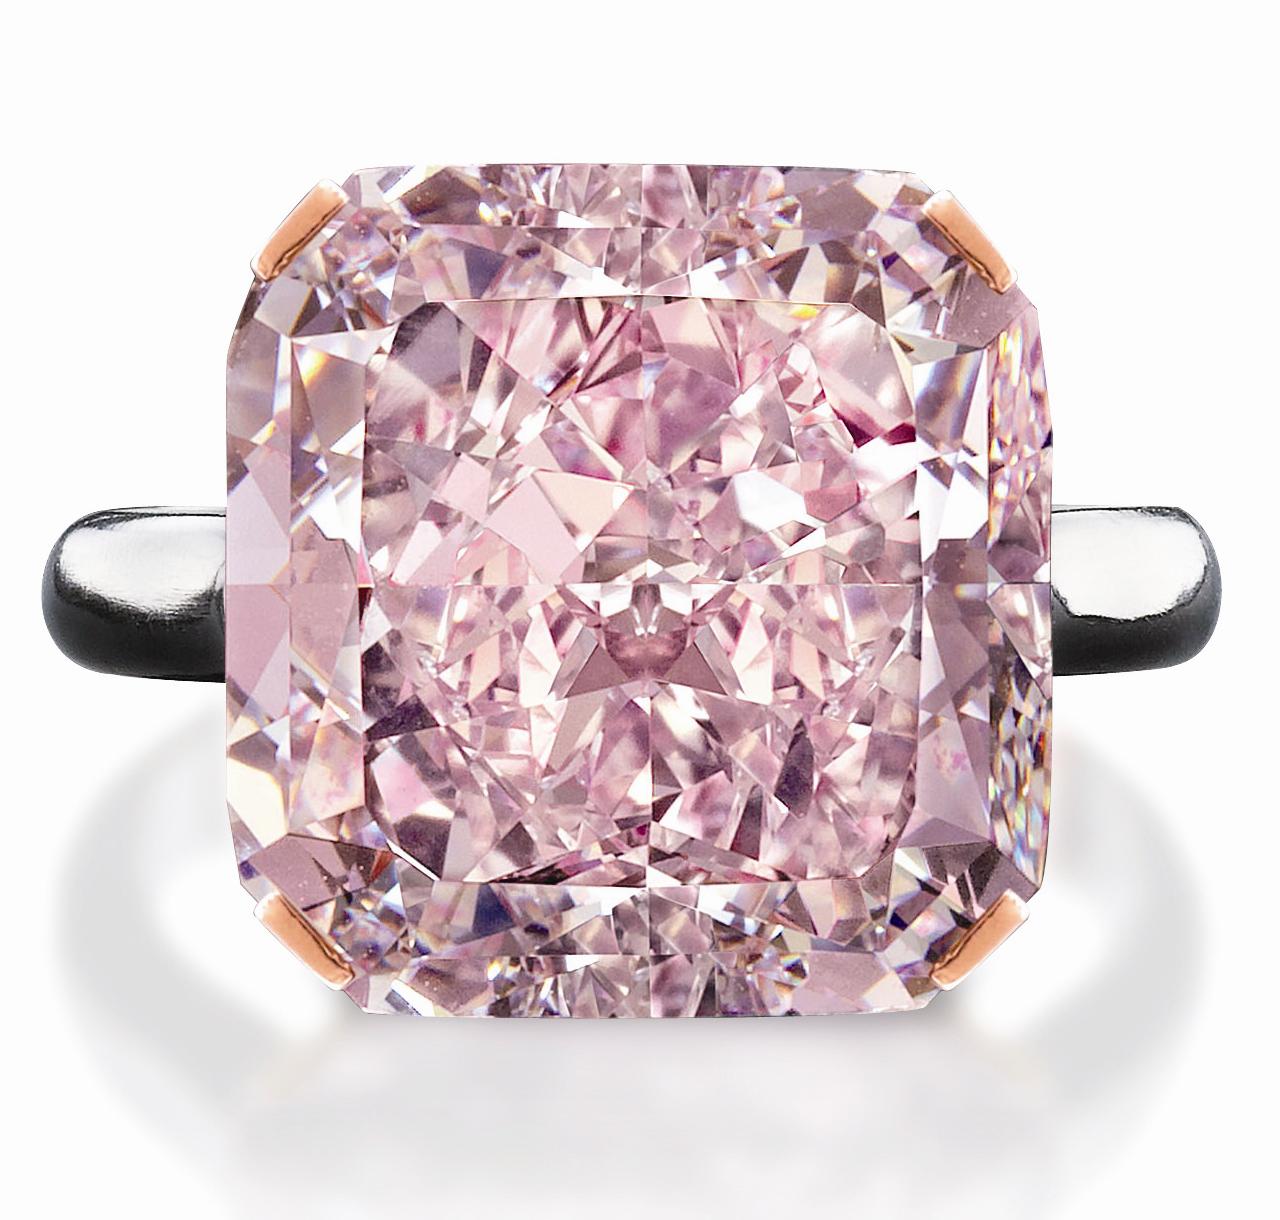 Jewelry News Network: Edmonton Jeweler to Display 10-Ct ...